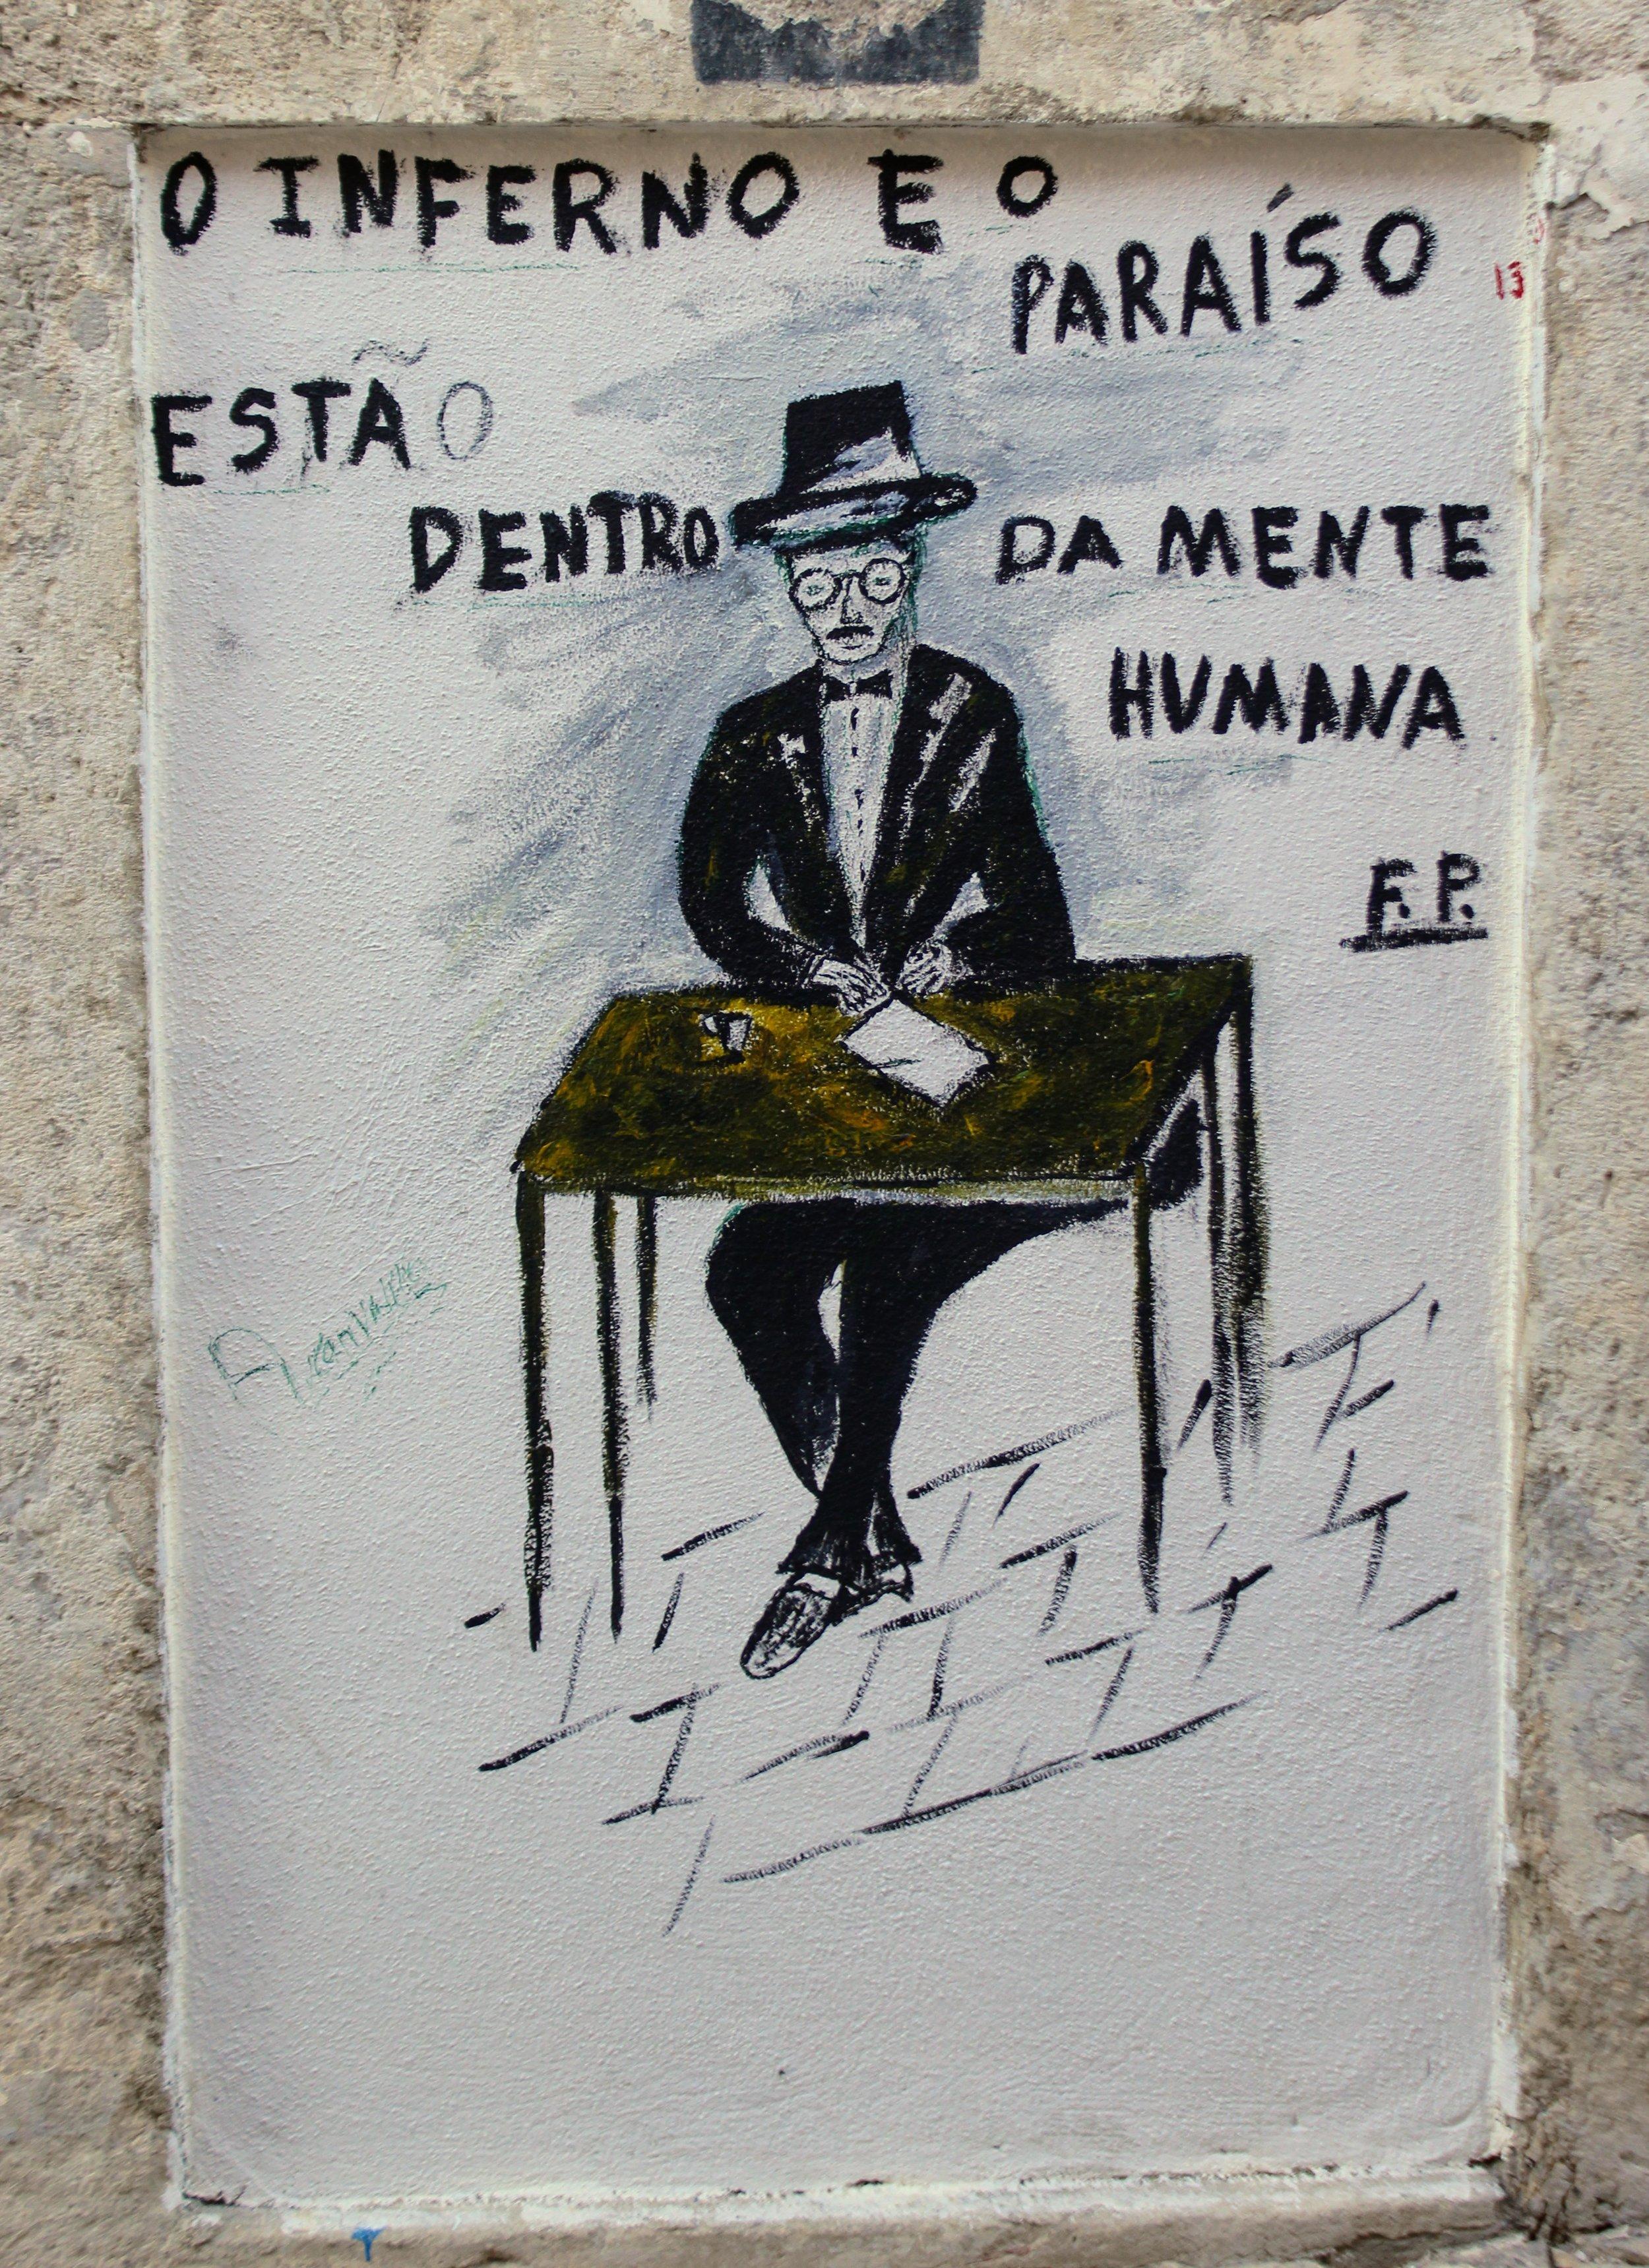 Street art featuring celebrated Portuguese poet Fernando Pessoa.